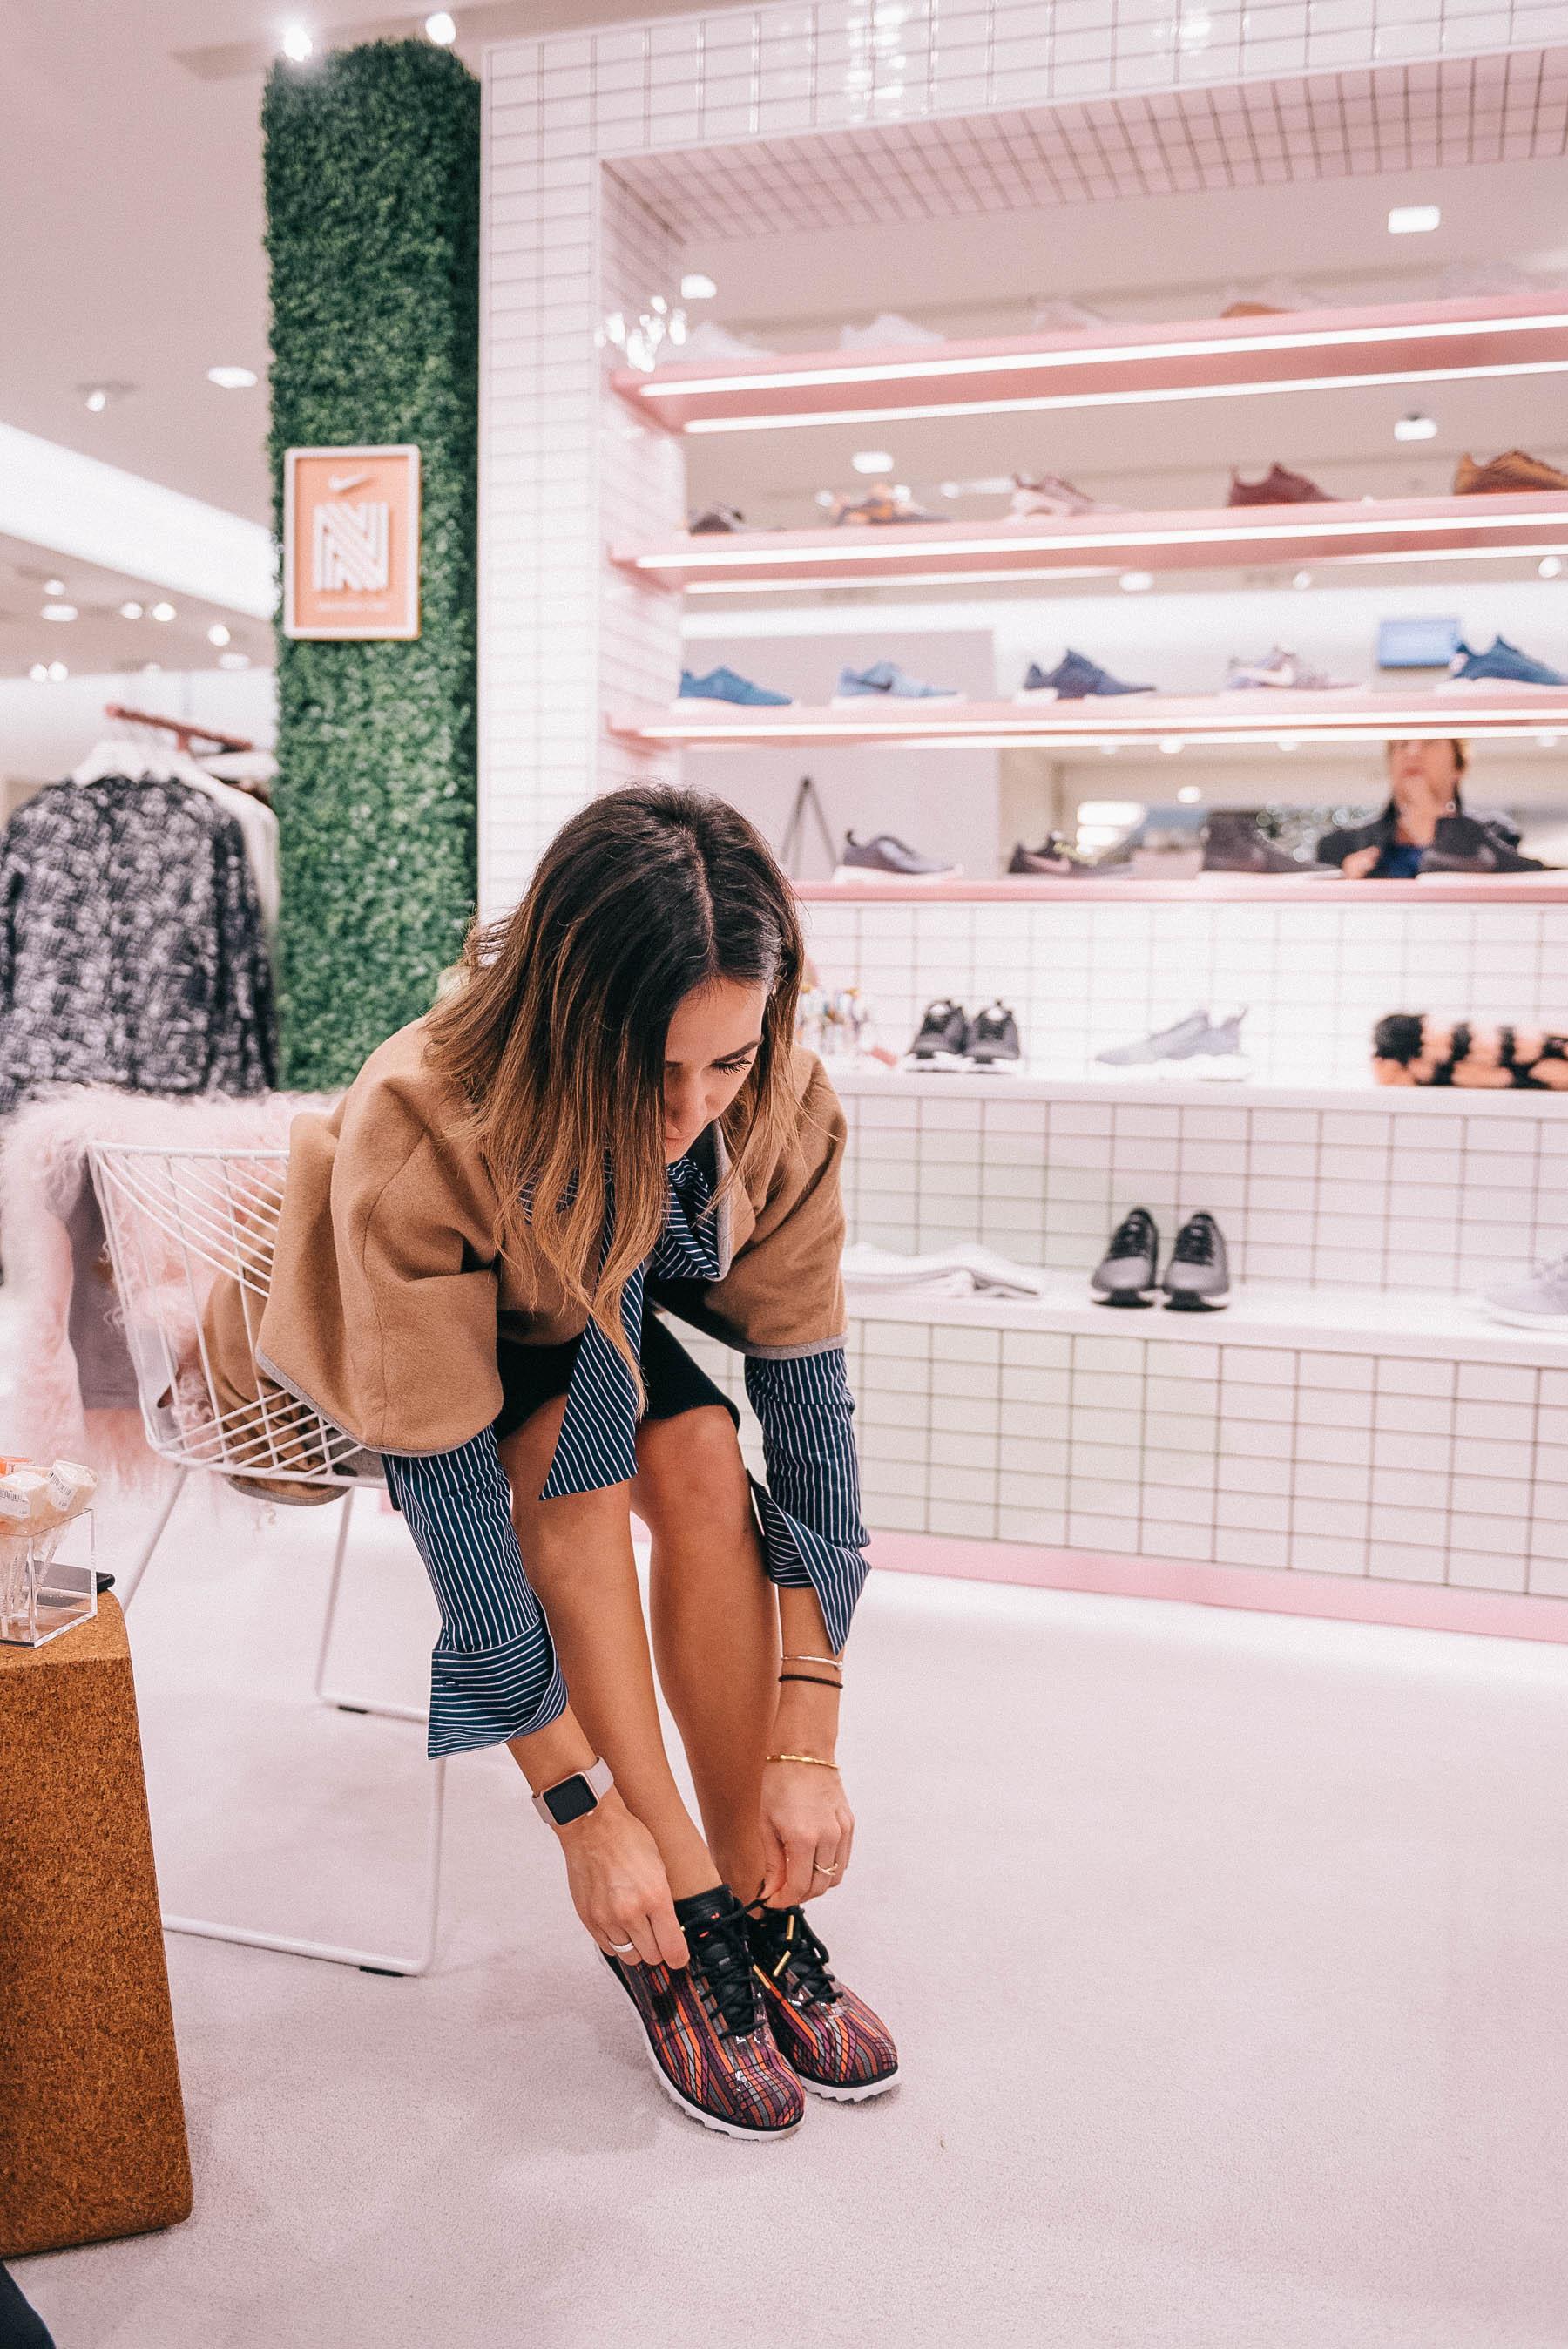 Nike Beautiful x Powerful Cortez and Chicago Fashion Blogger